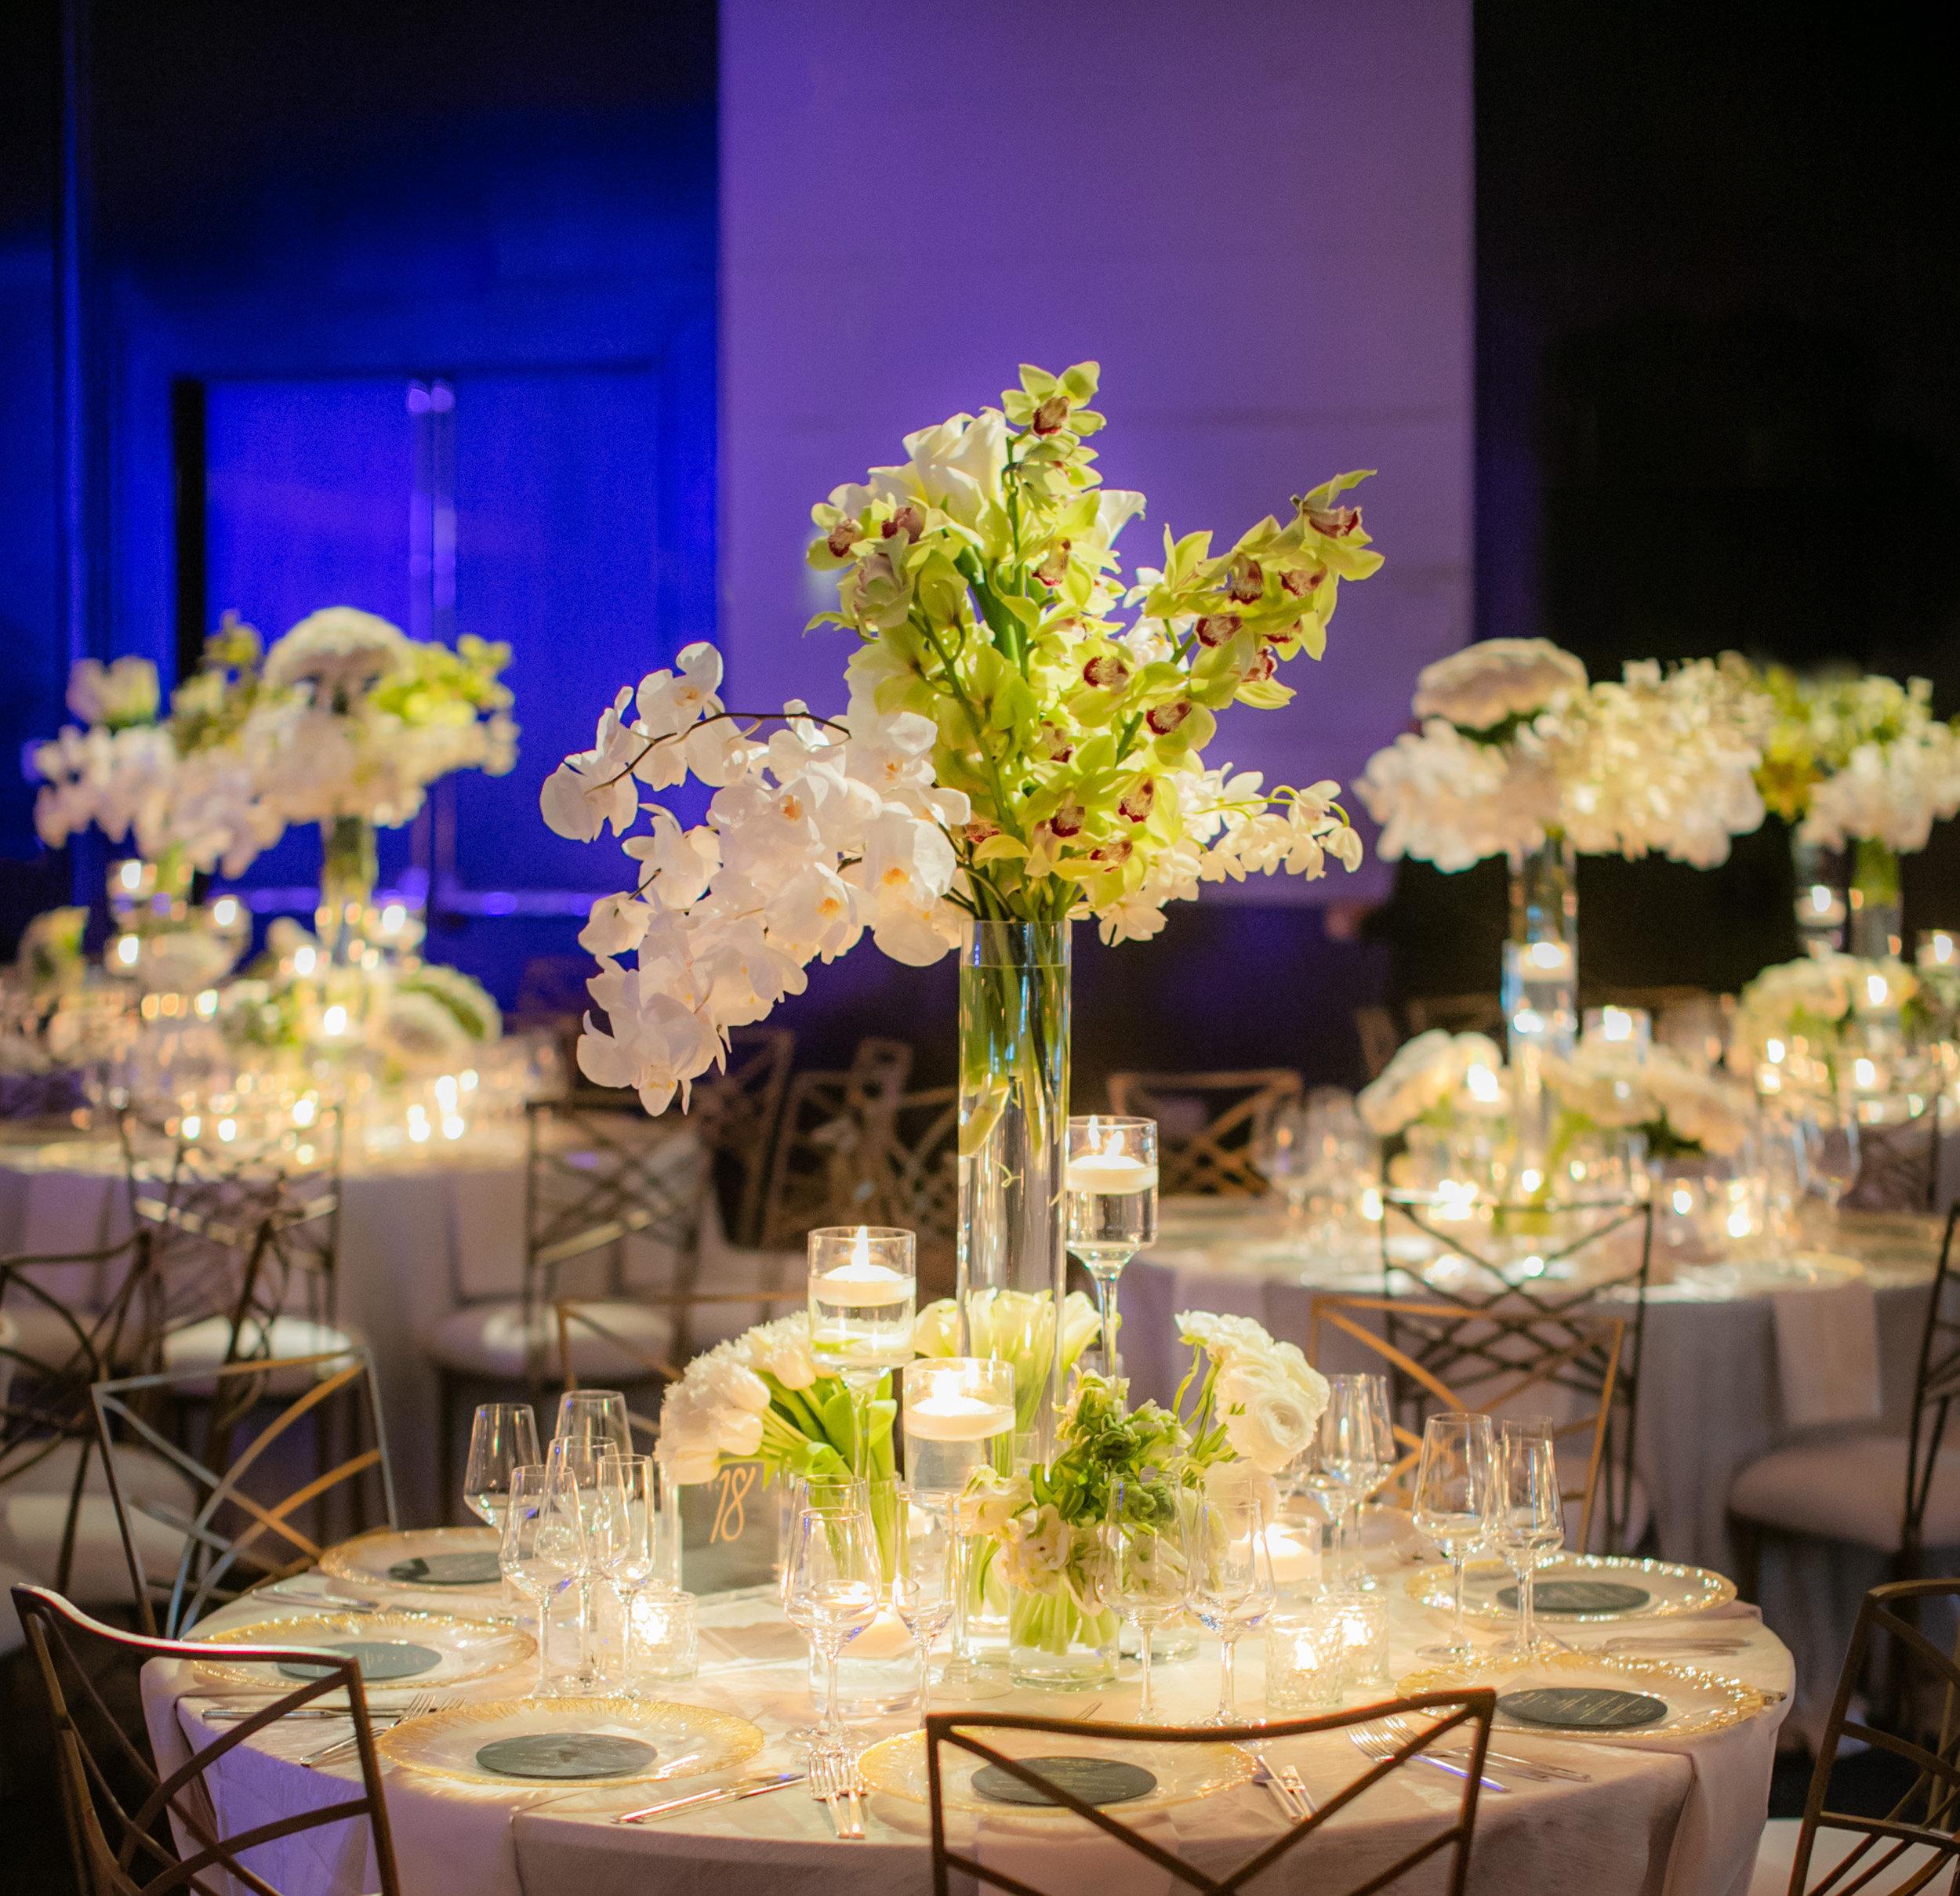 Andrea-Freeman-Events-NY-Wedding-Planner-Mandarin-Oriental-Wedding-9.jpg